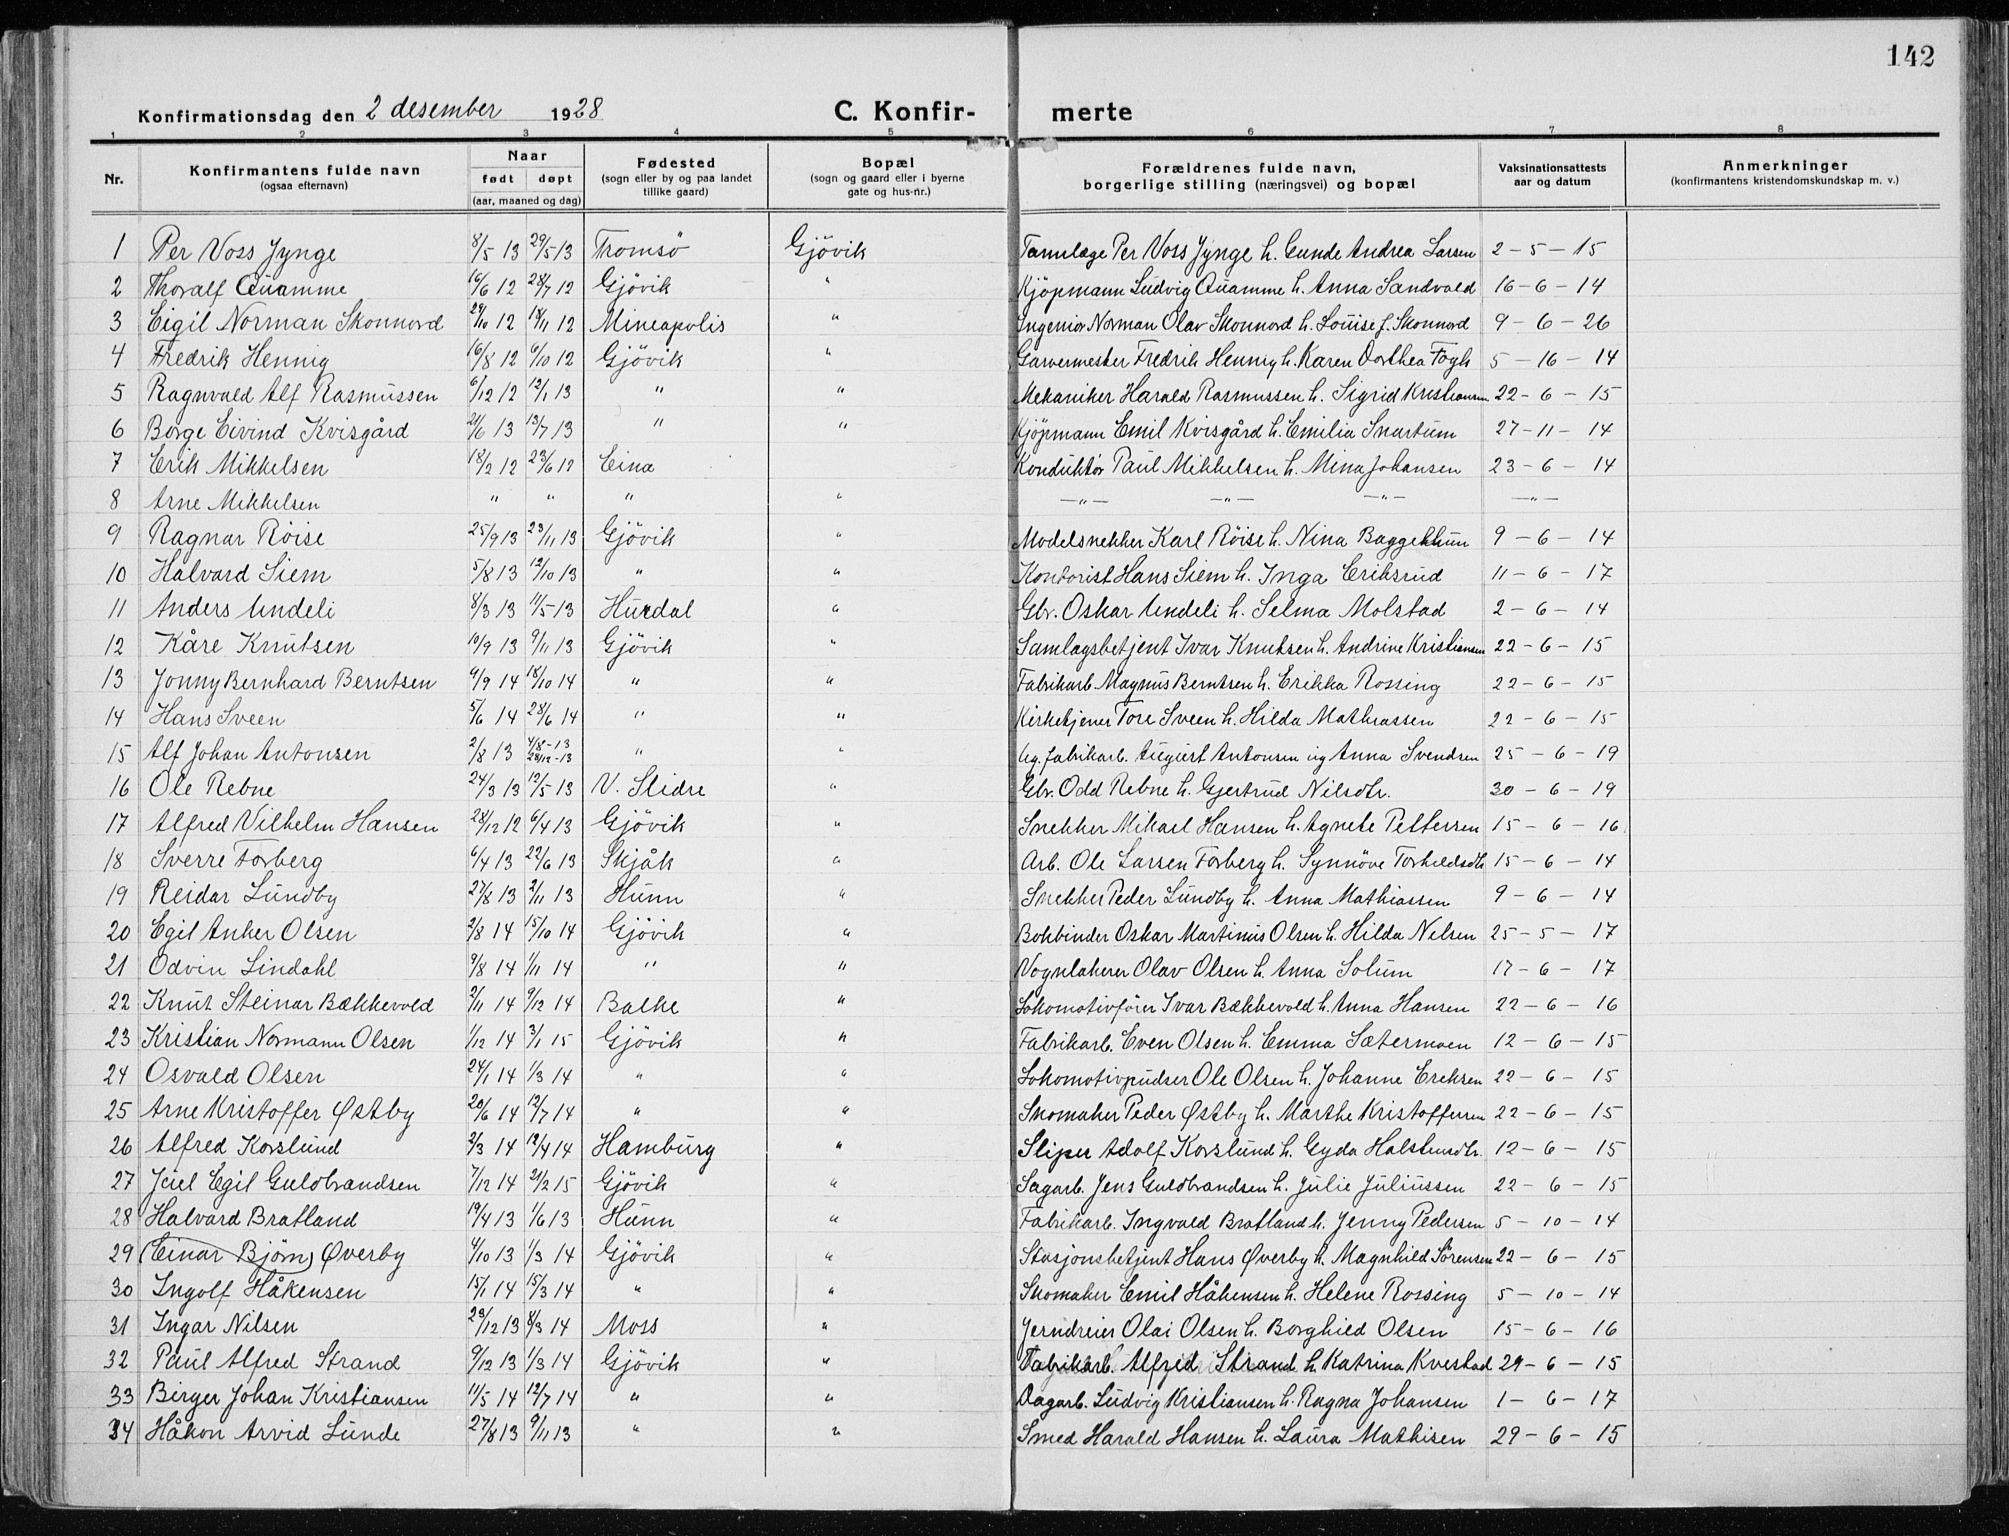 SAH, Vardal prestekontor, H/Ha/Haa/L0015: Ministerialbok nr. 15, 1923-1937, s. 142